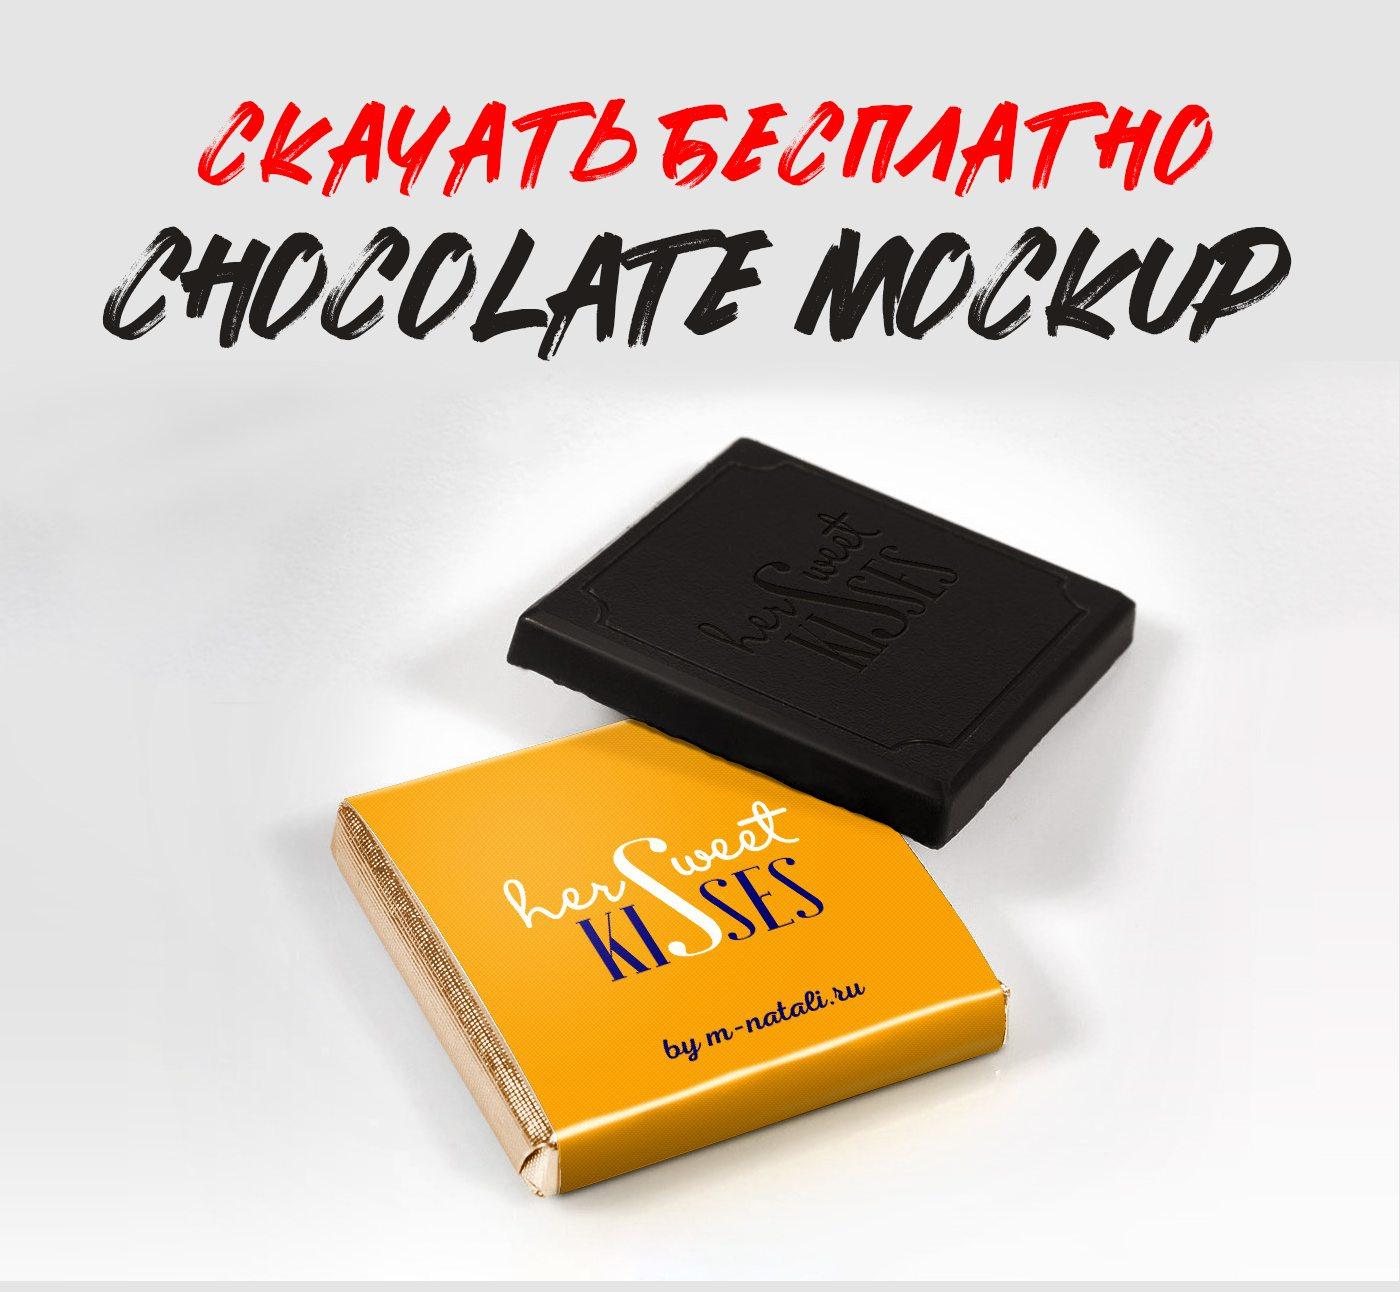 FREE Chocolate Mockup PSD